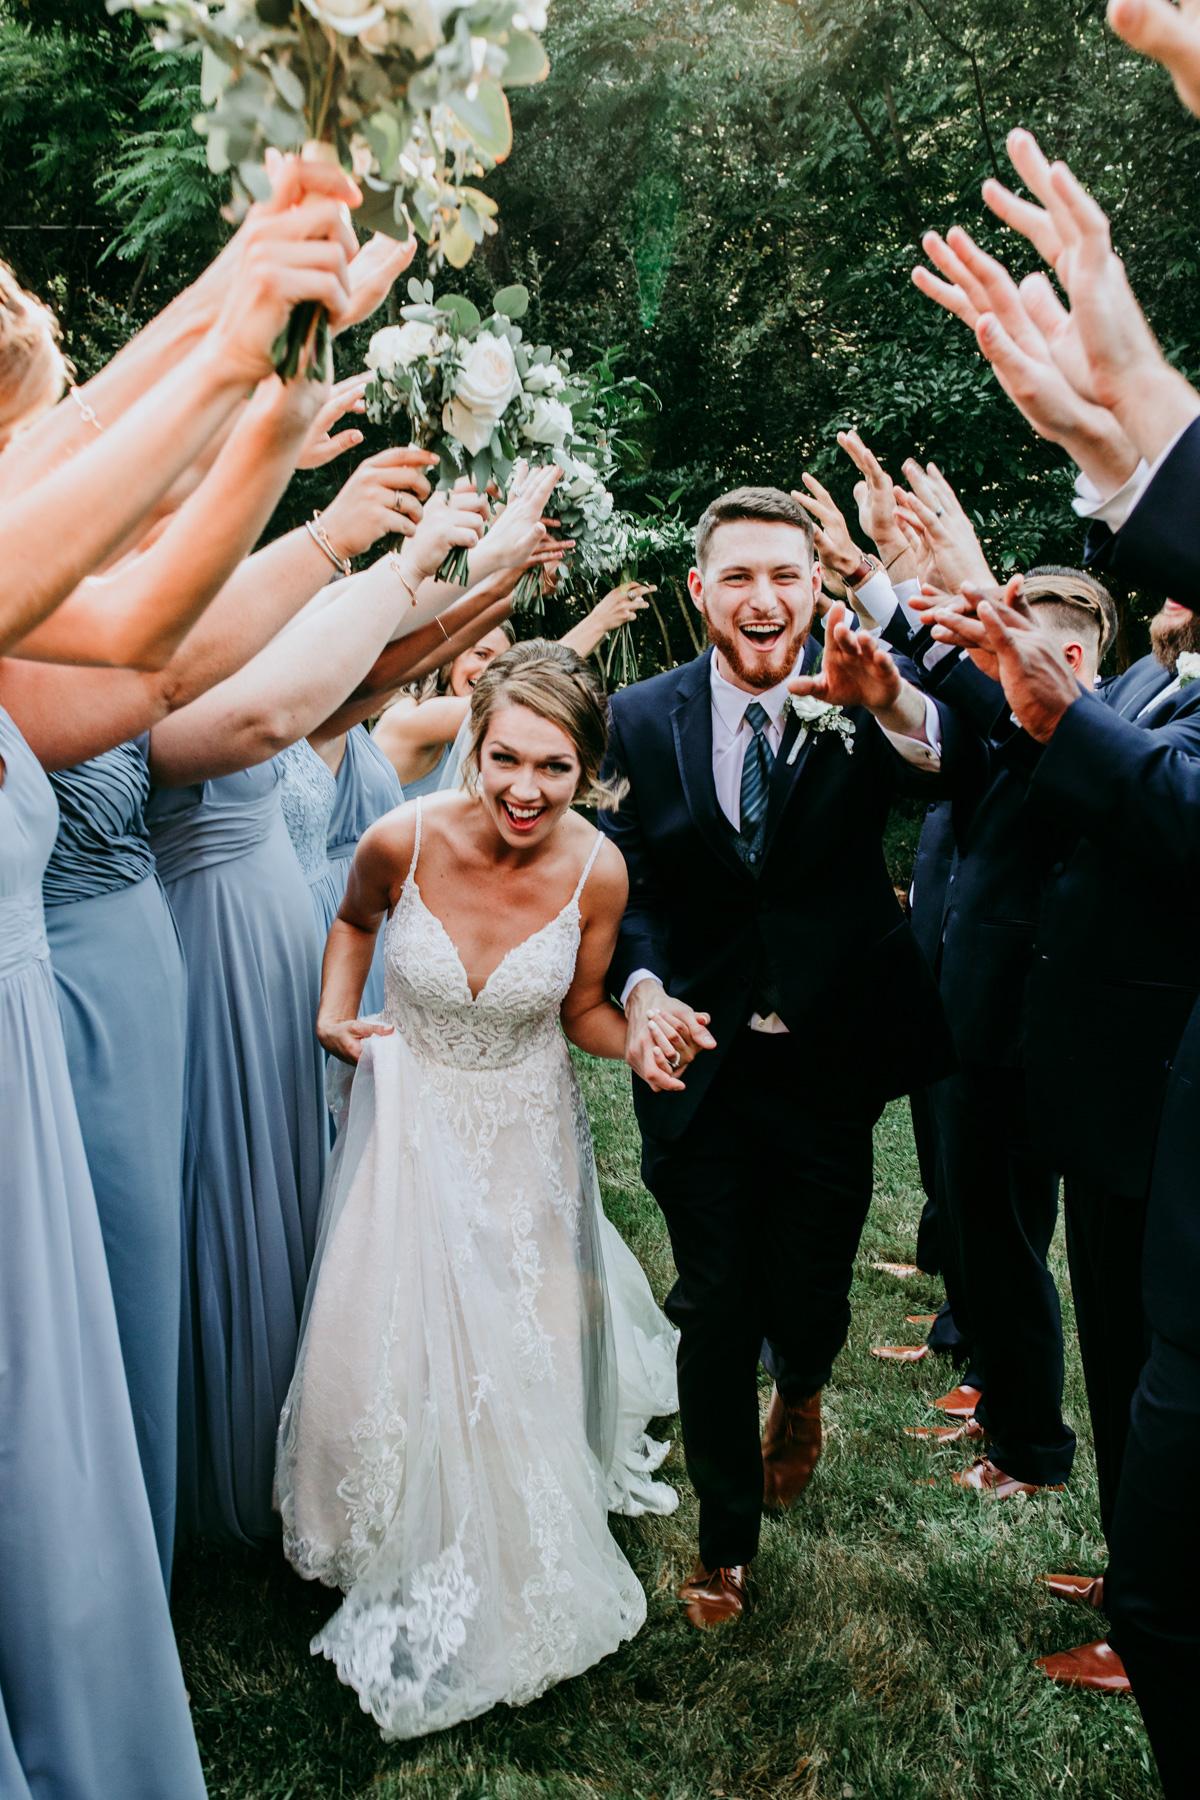 wedding-photos-ideas.jpg